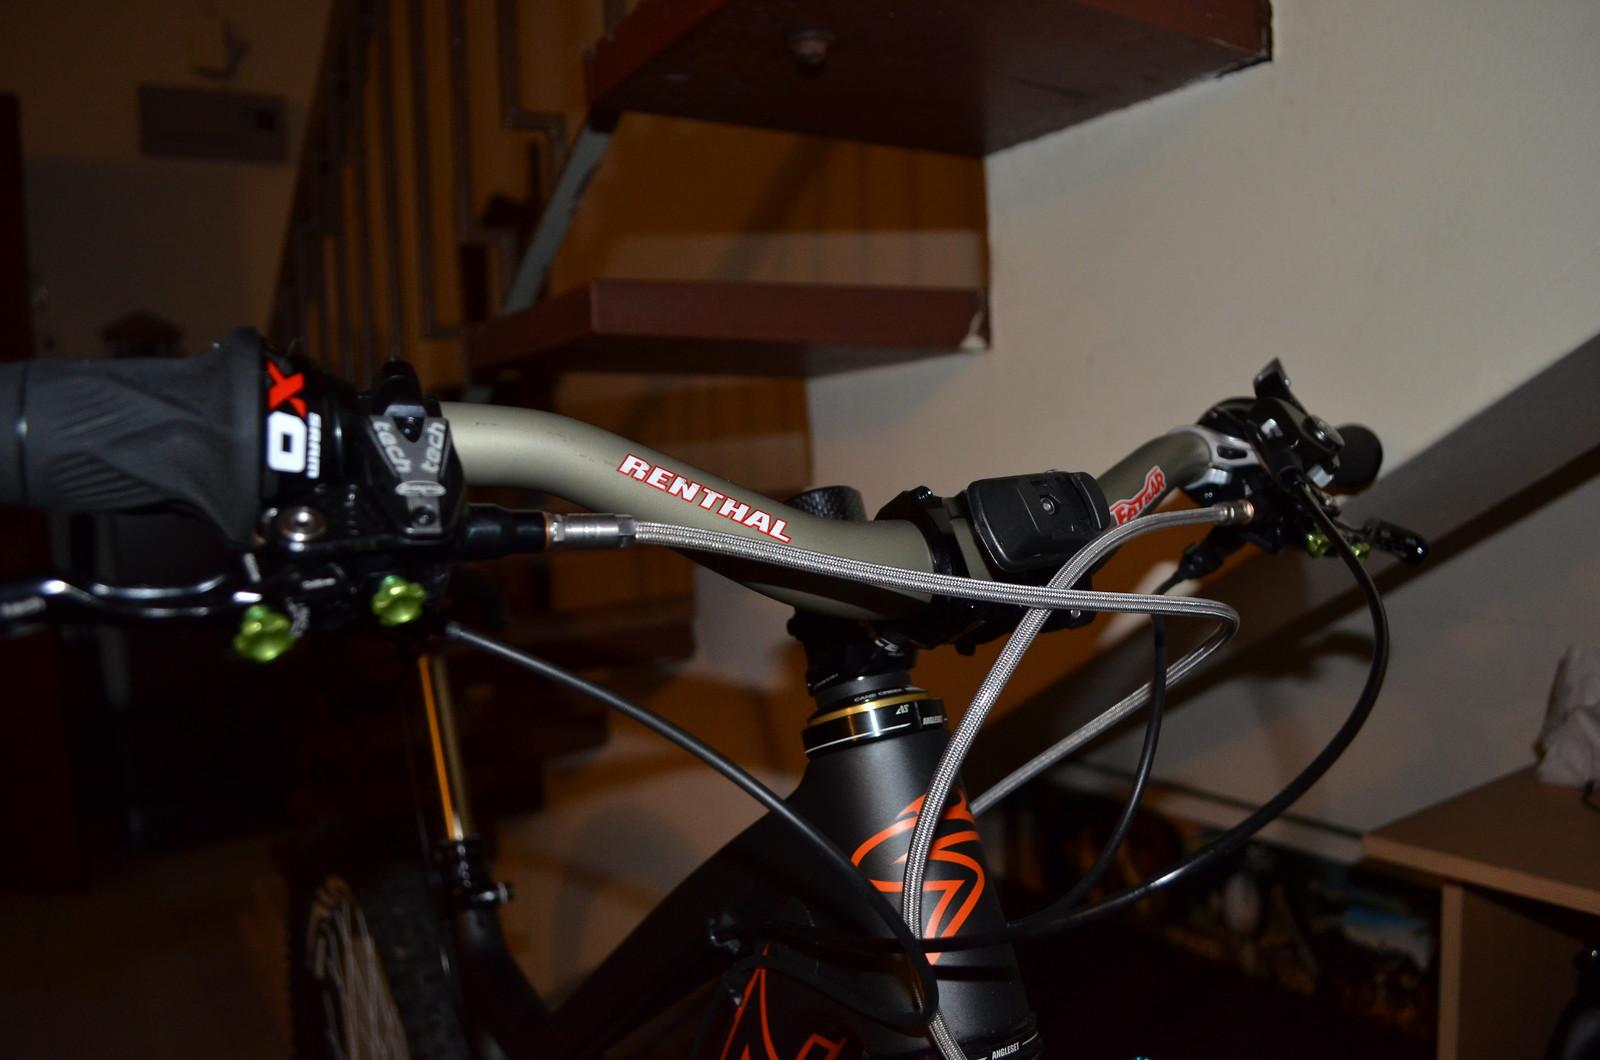 DSC 4573 - kenneth.jonathan.perkins.jr - Mountain Biking Pictures - Vital MTB